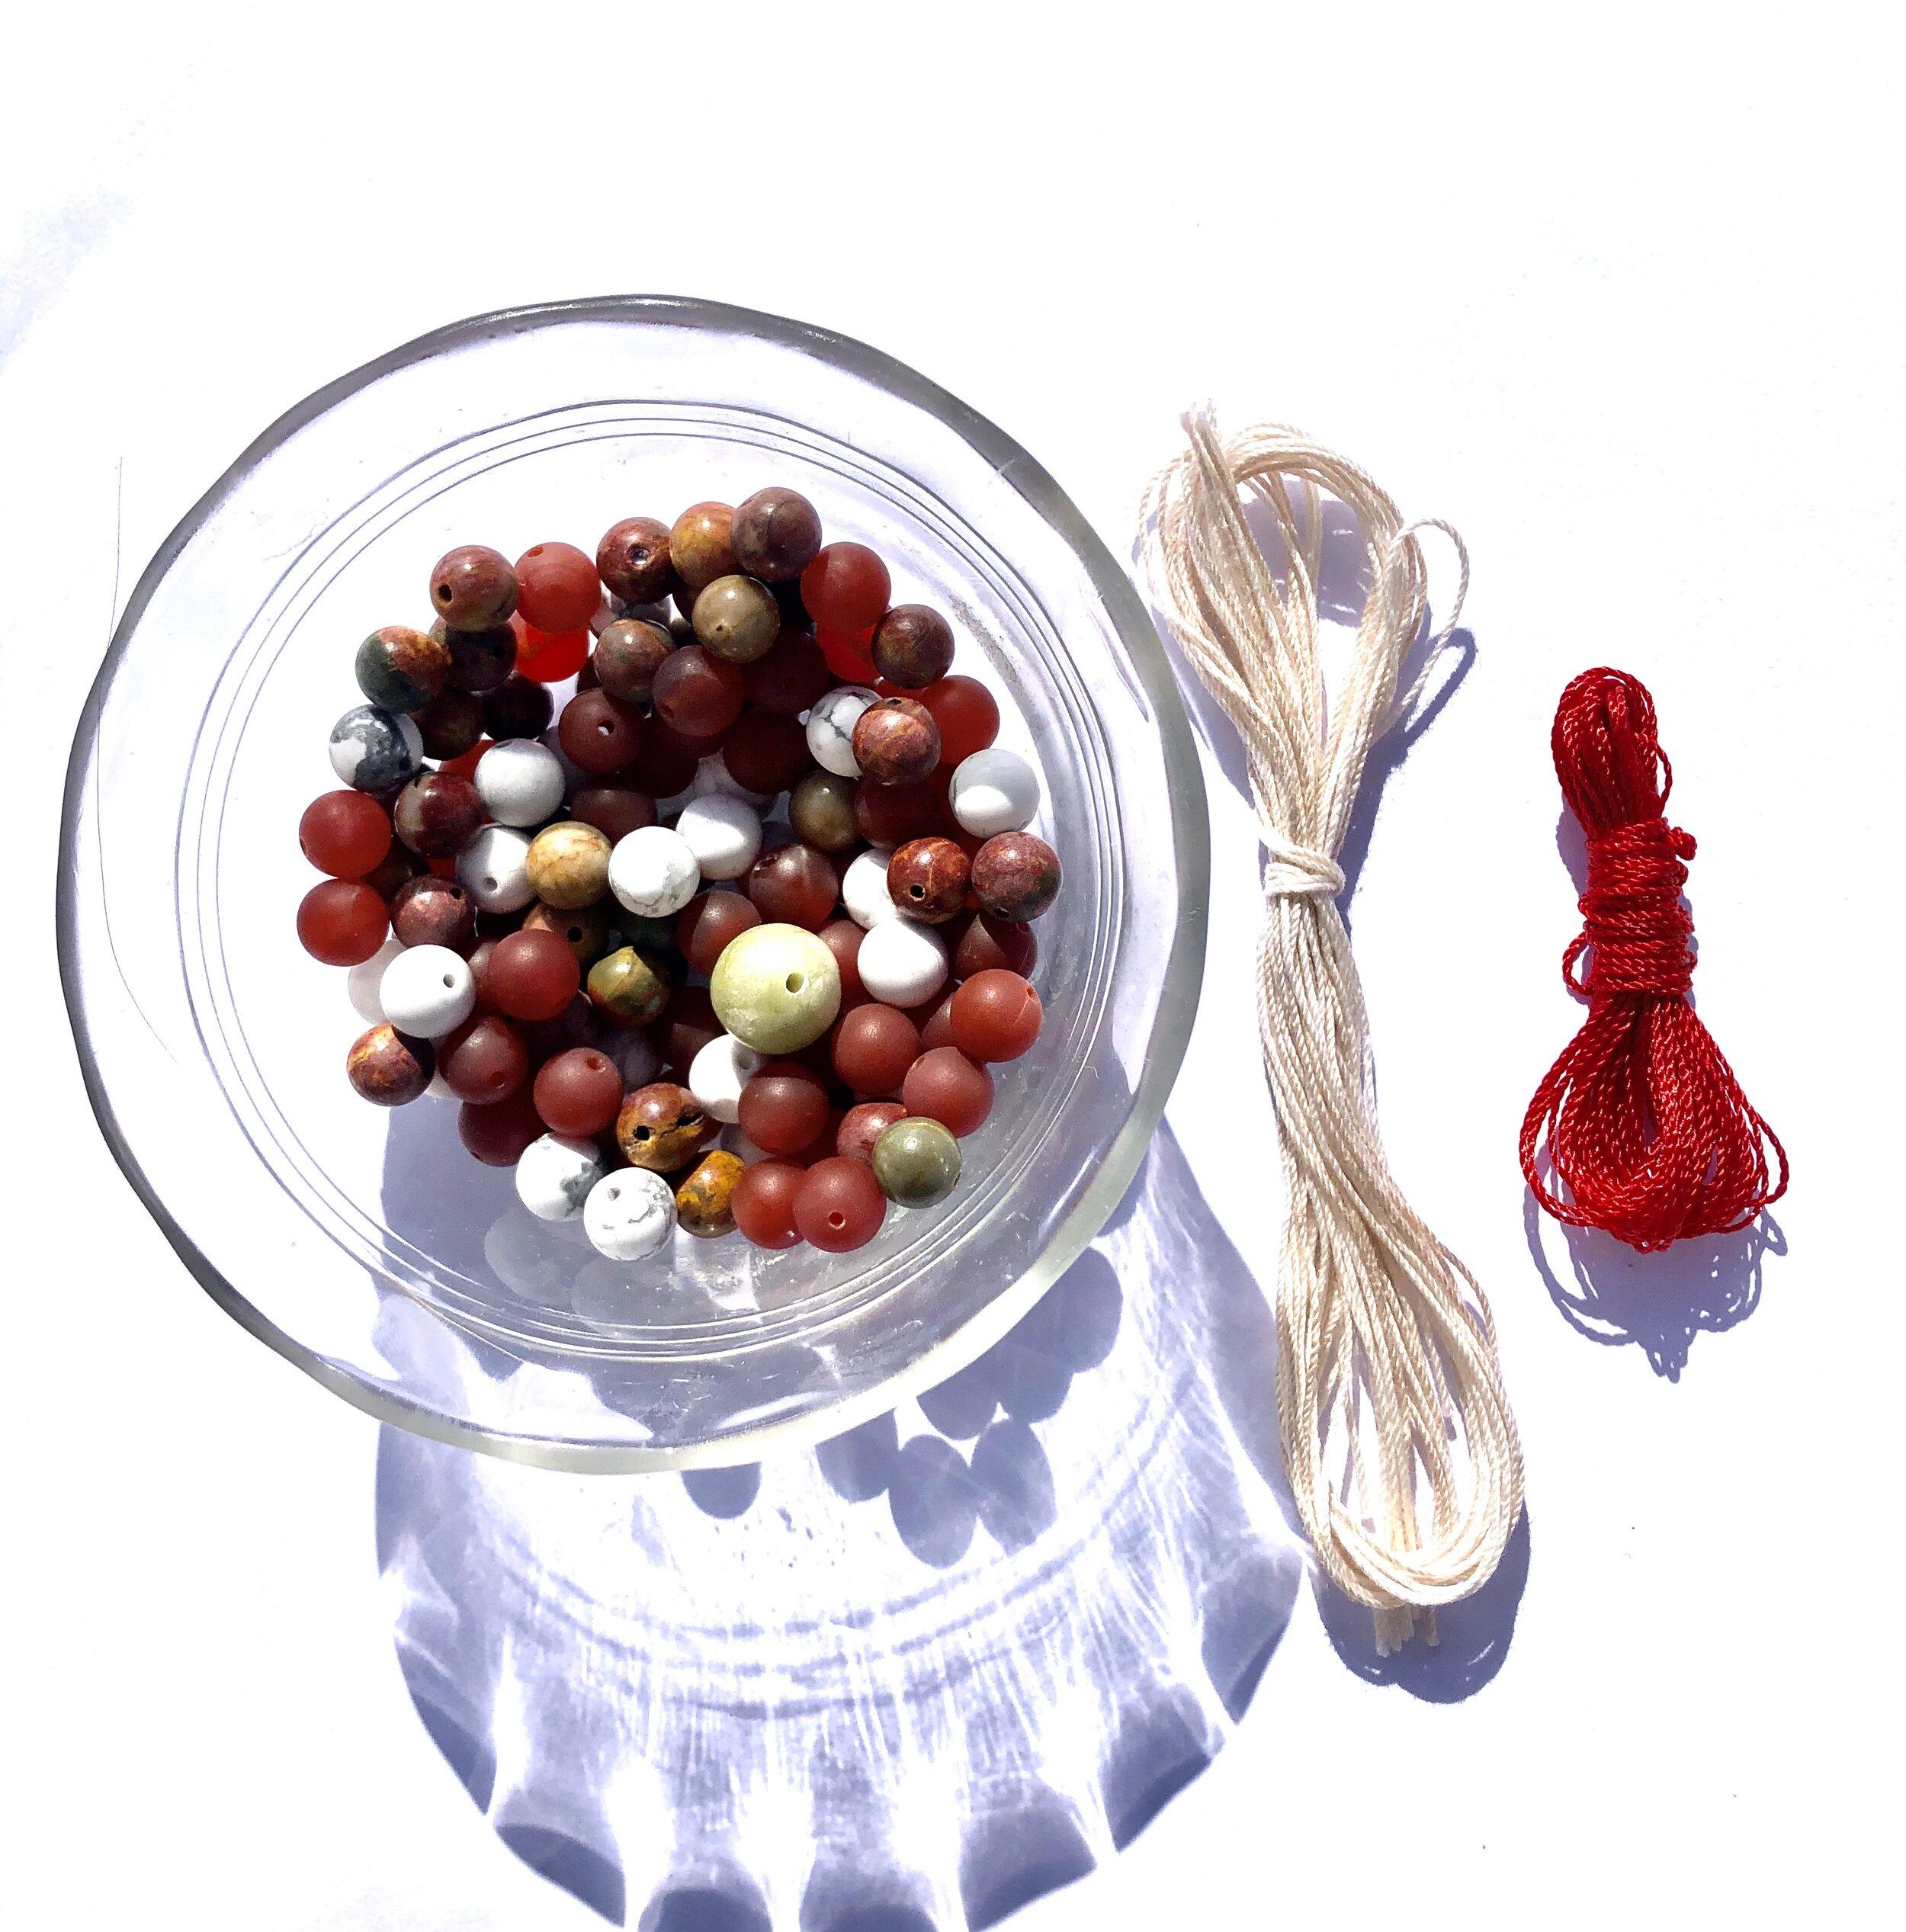 make your own high quality mala with red jasper elephant guru bead and sandalwood mala beads Elephant Mala Kit